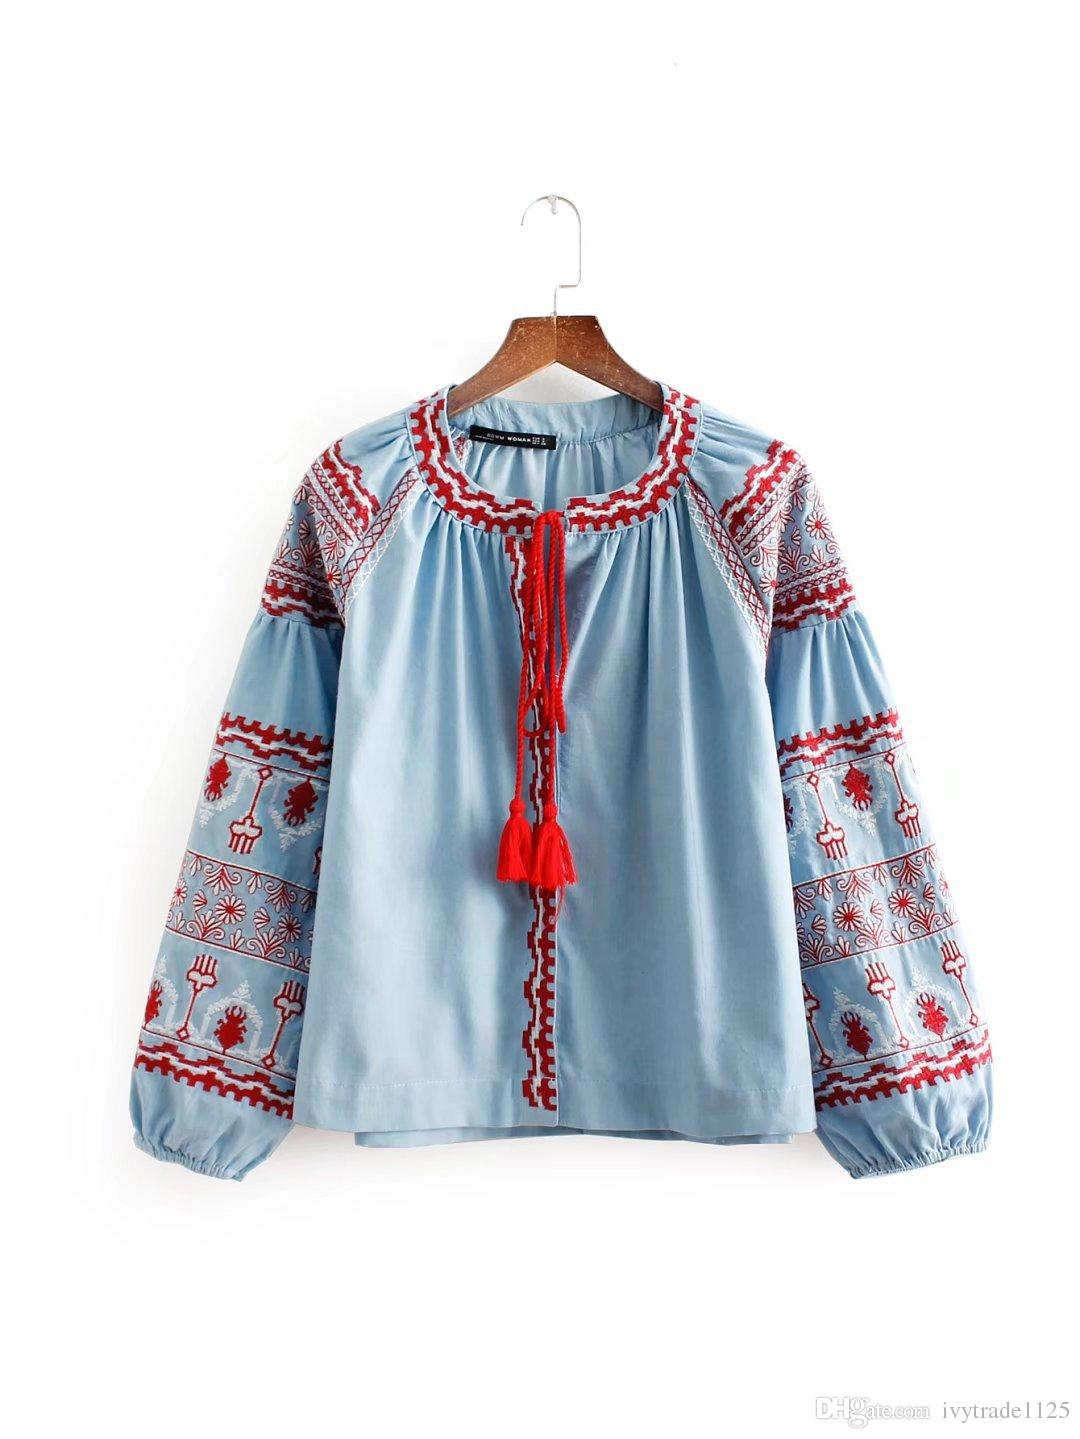 Mulheres roupas top gola Redonda manga longa Bordado Design mulheres blusa senhora casual camisas elegantes